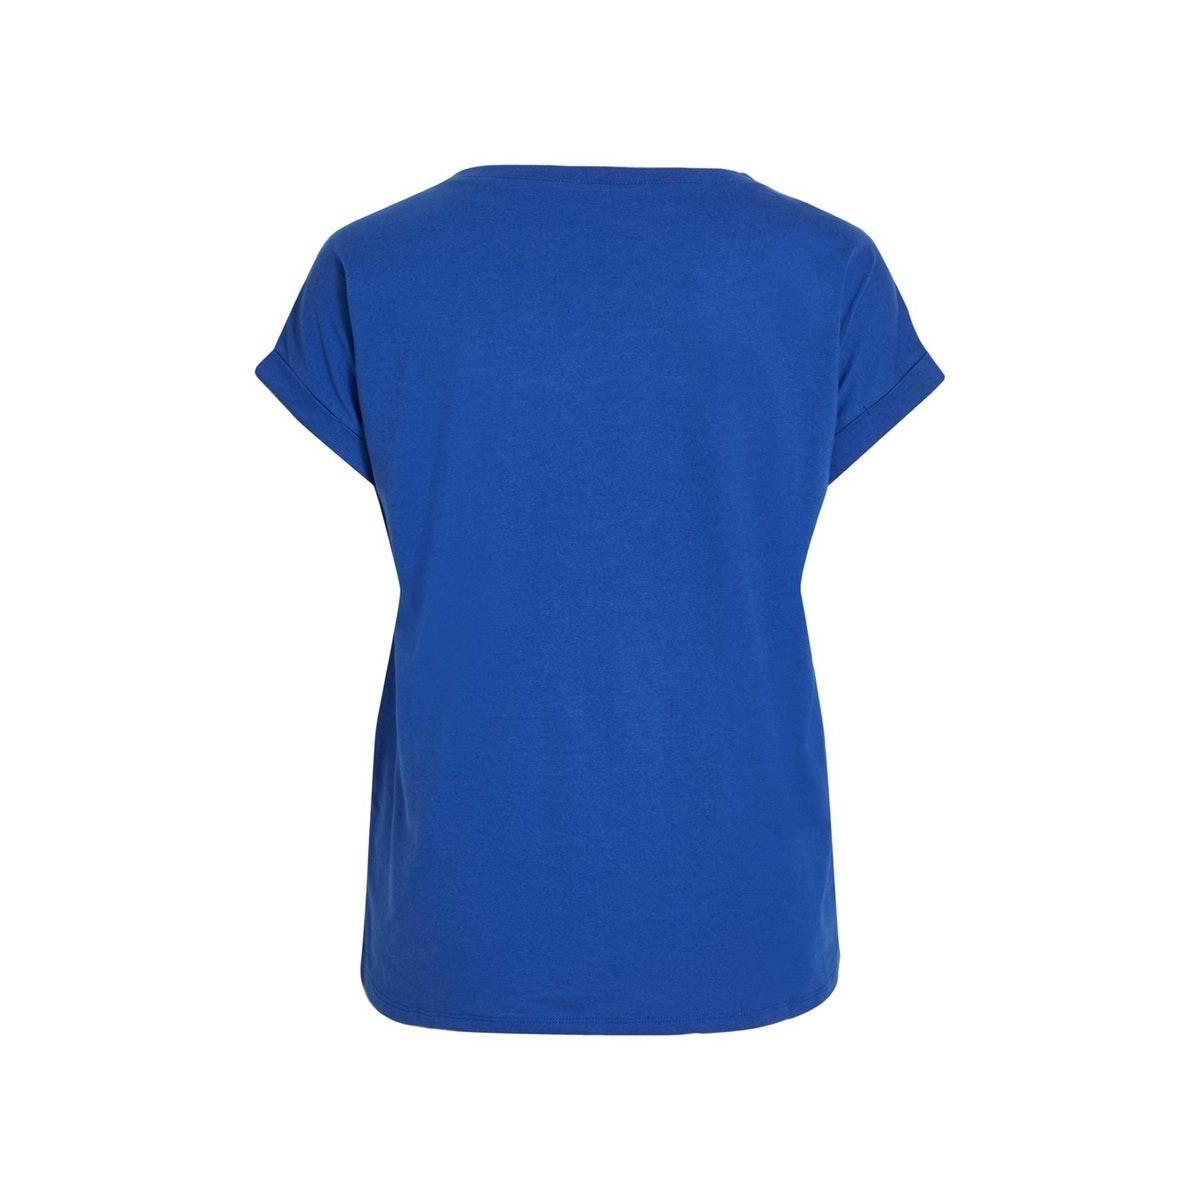 vidreamers pure t-shirt-noos 14025668 vila t-shirt mazarine blue